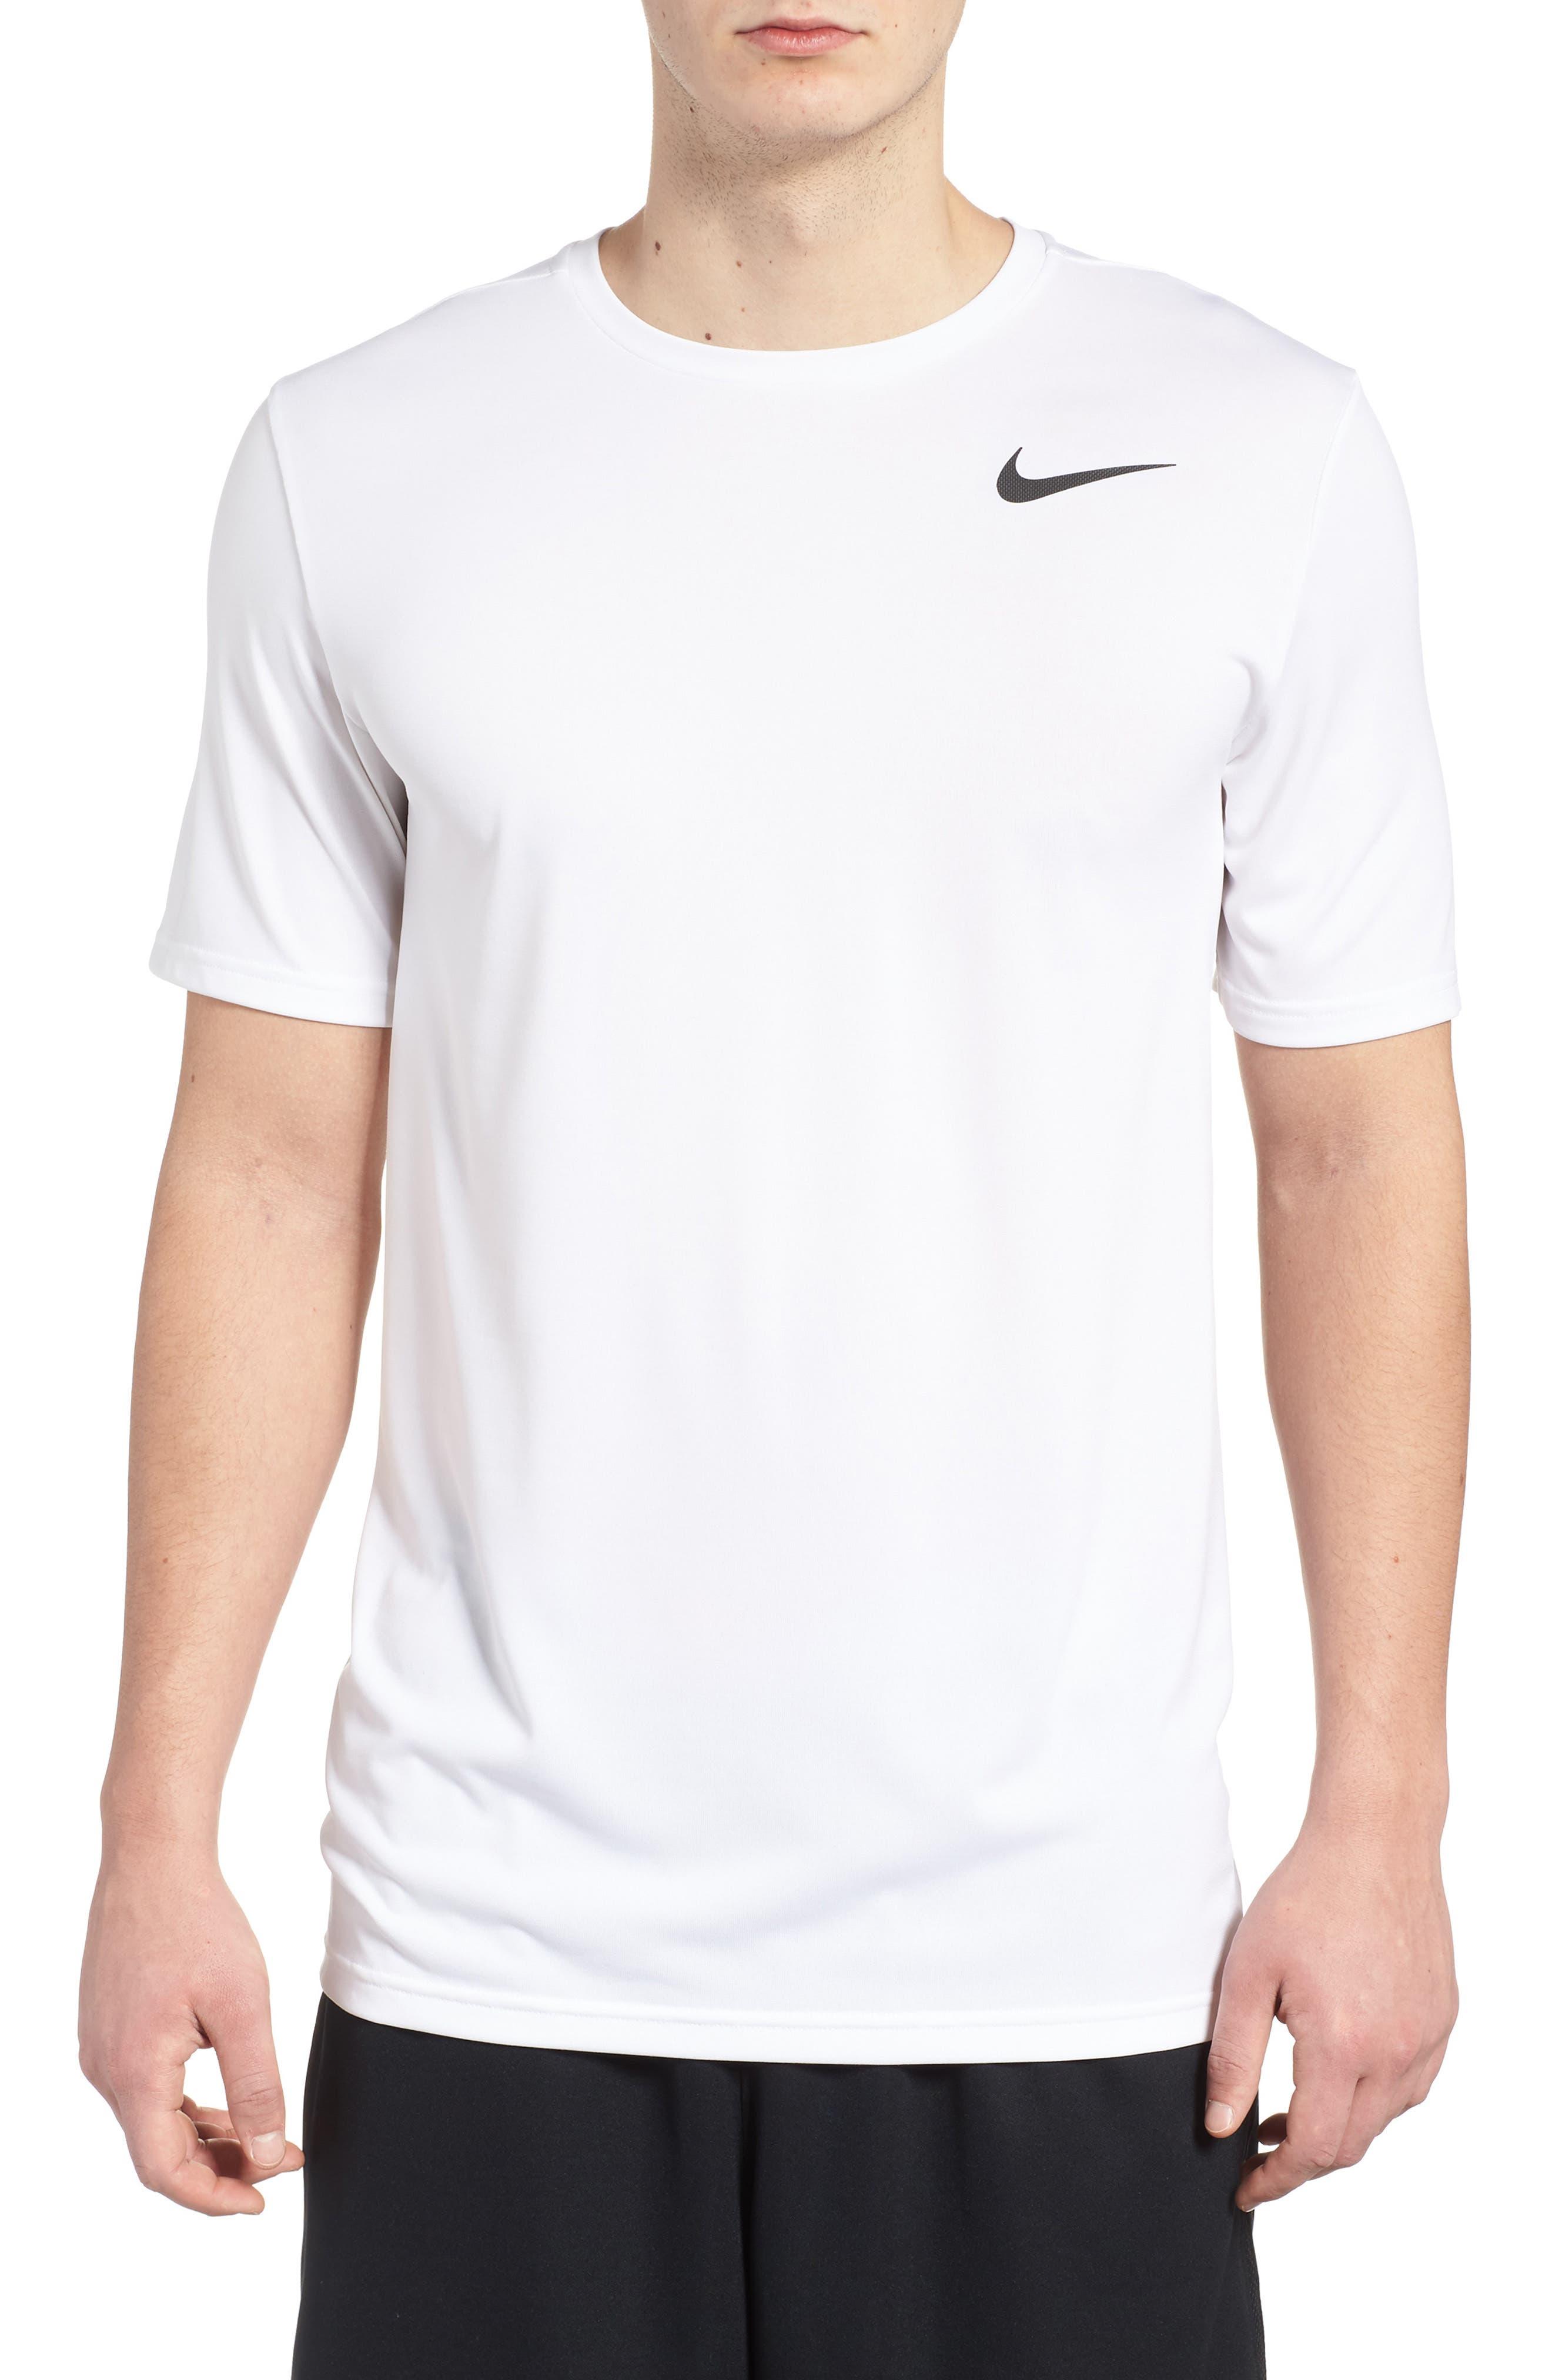 Hyper Dry Training T-Shirt,                             Main thumbnail 1, color,                             WHITE/ WHITE/ BLACK